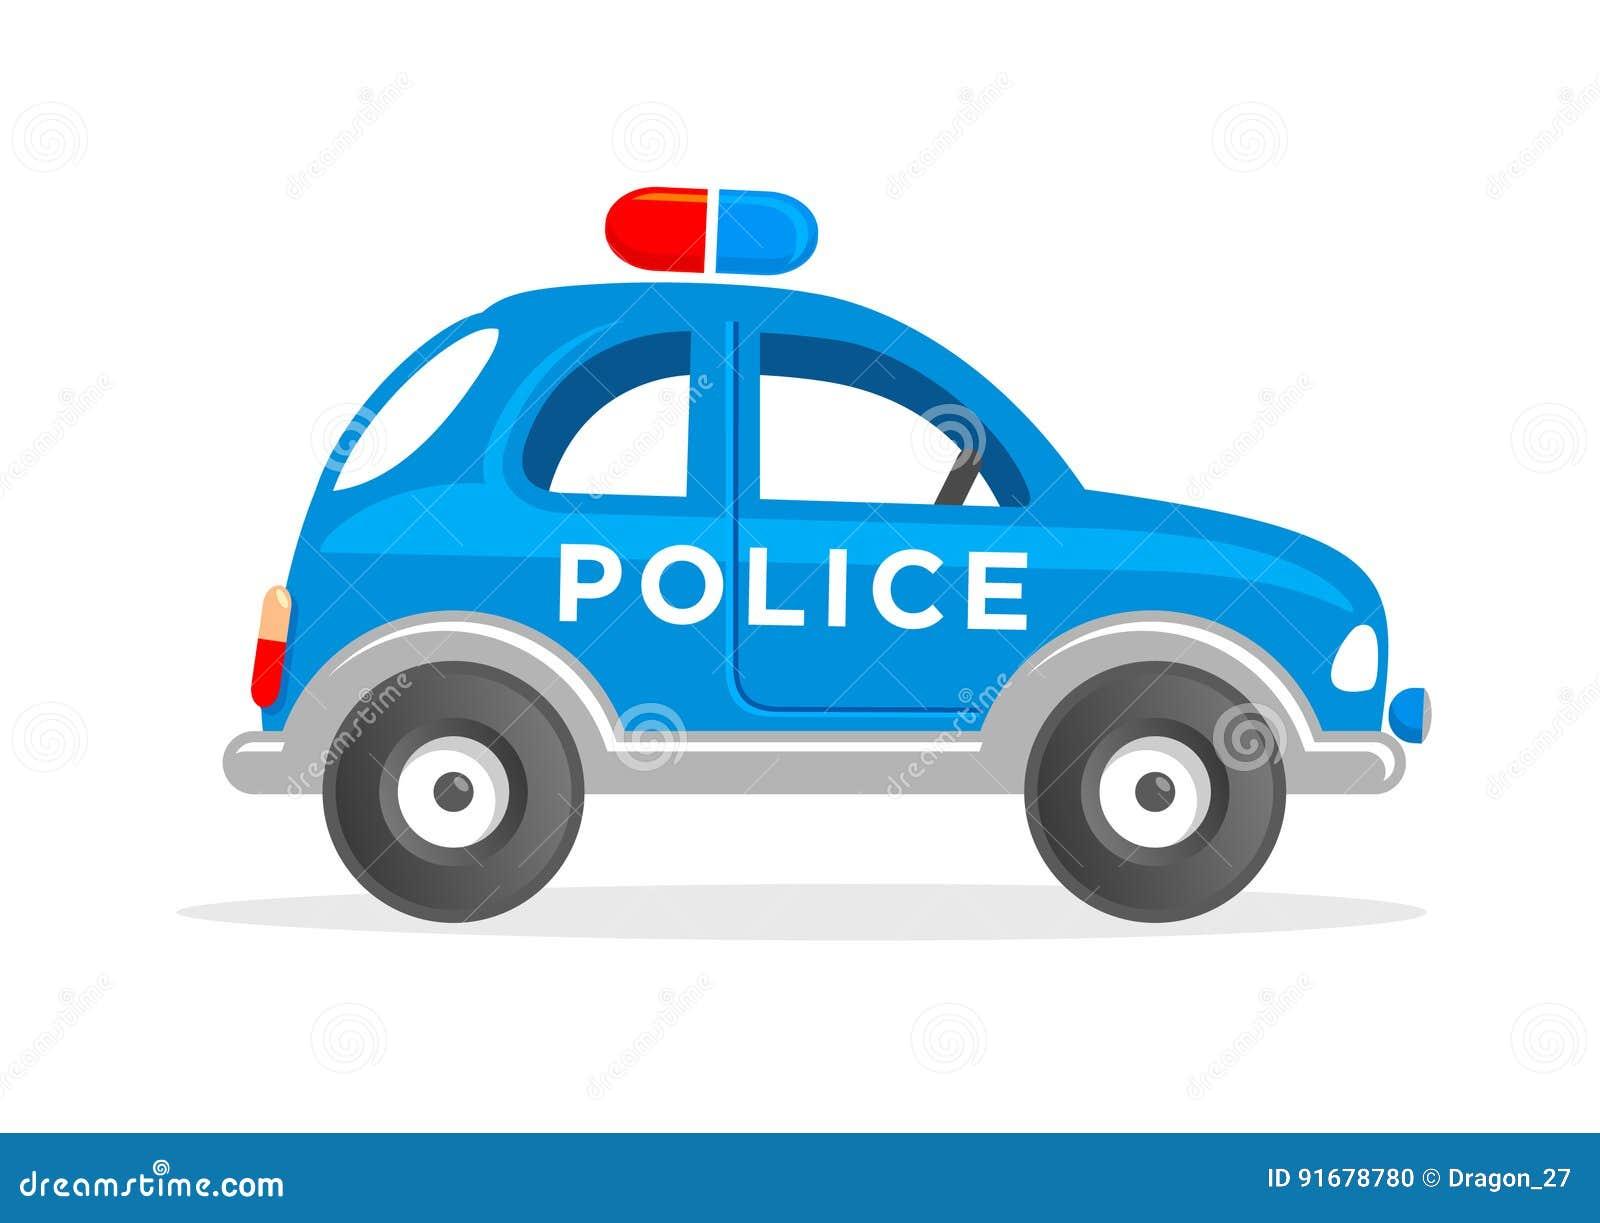 Cartoon Toy Police Car Vector Illustration Stock Vector